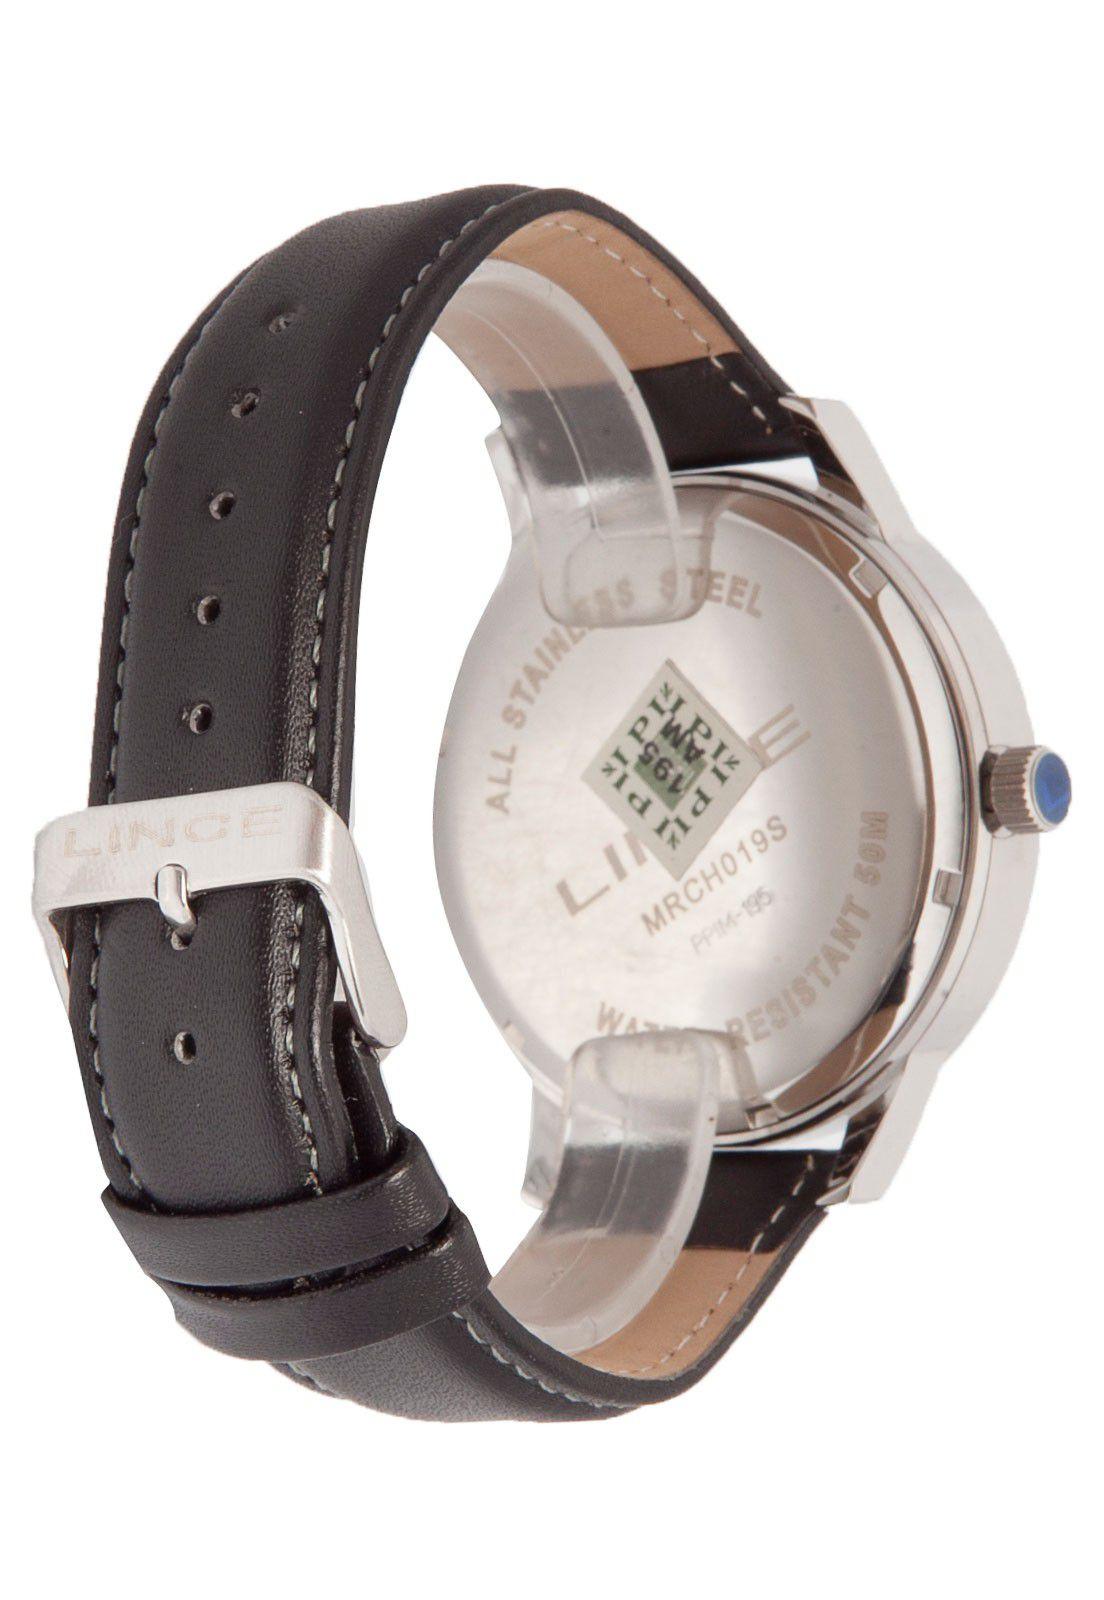 Relógio Masculino Lince MRCH019S-BVPX